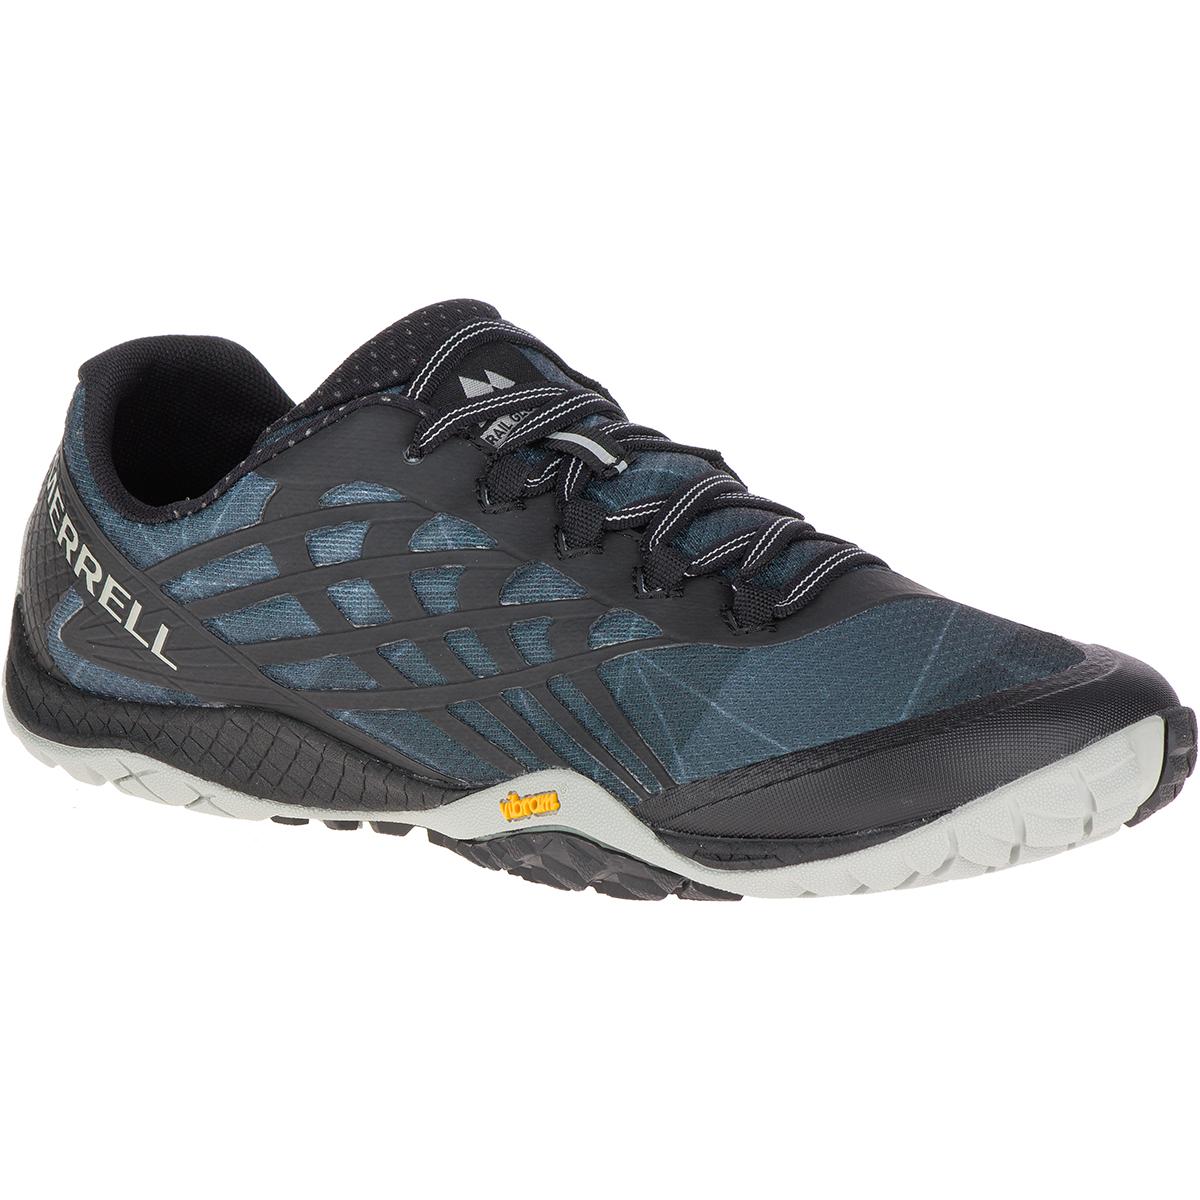 Trail Glove 4 Trail Running Shoes